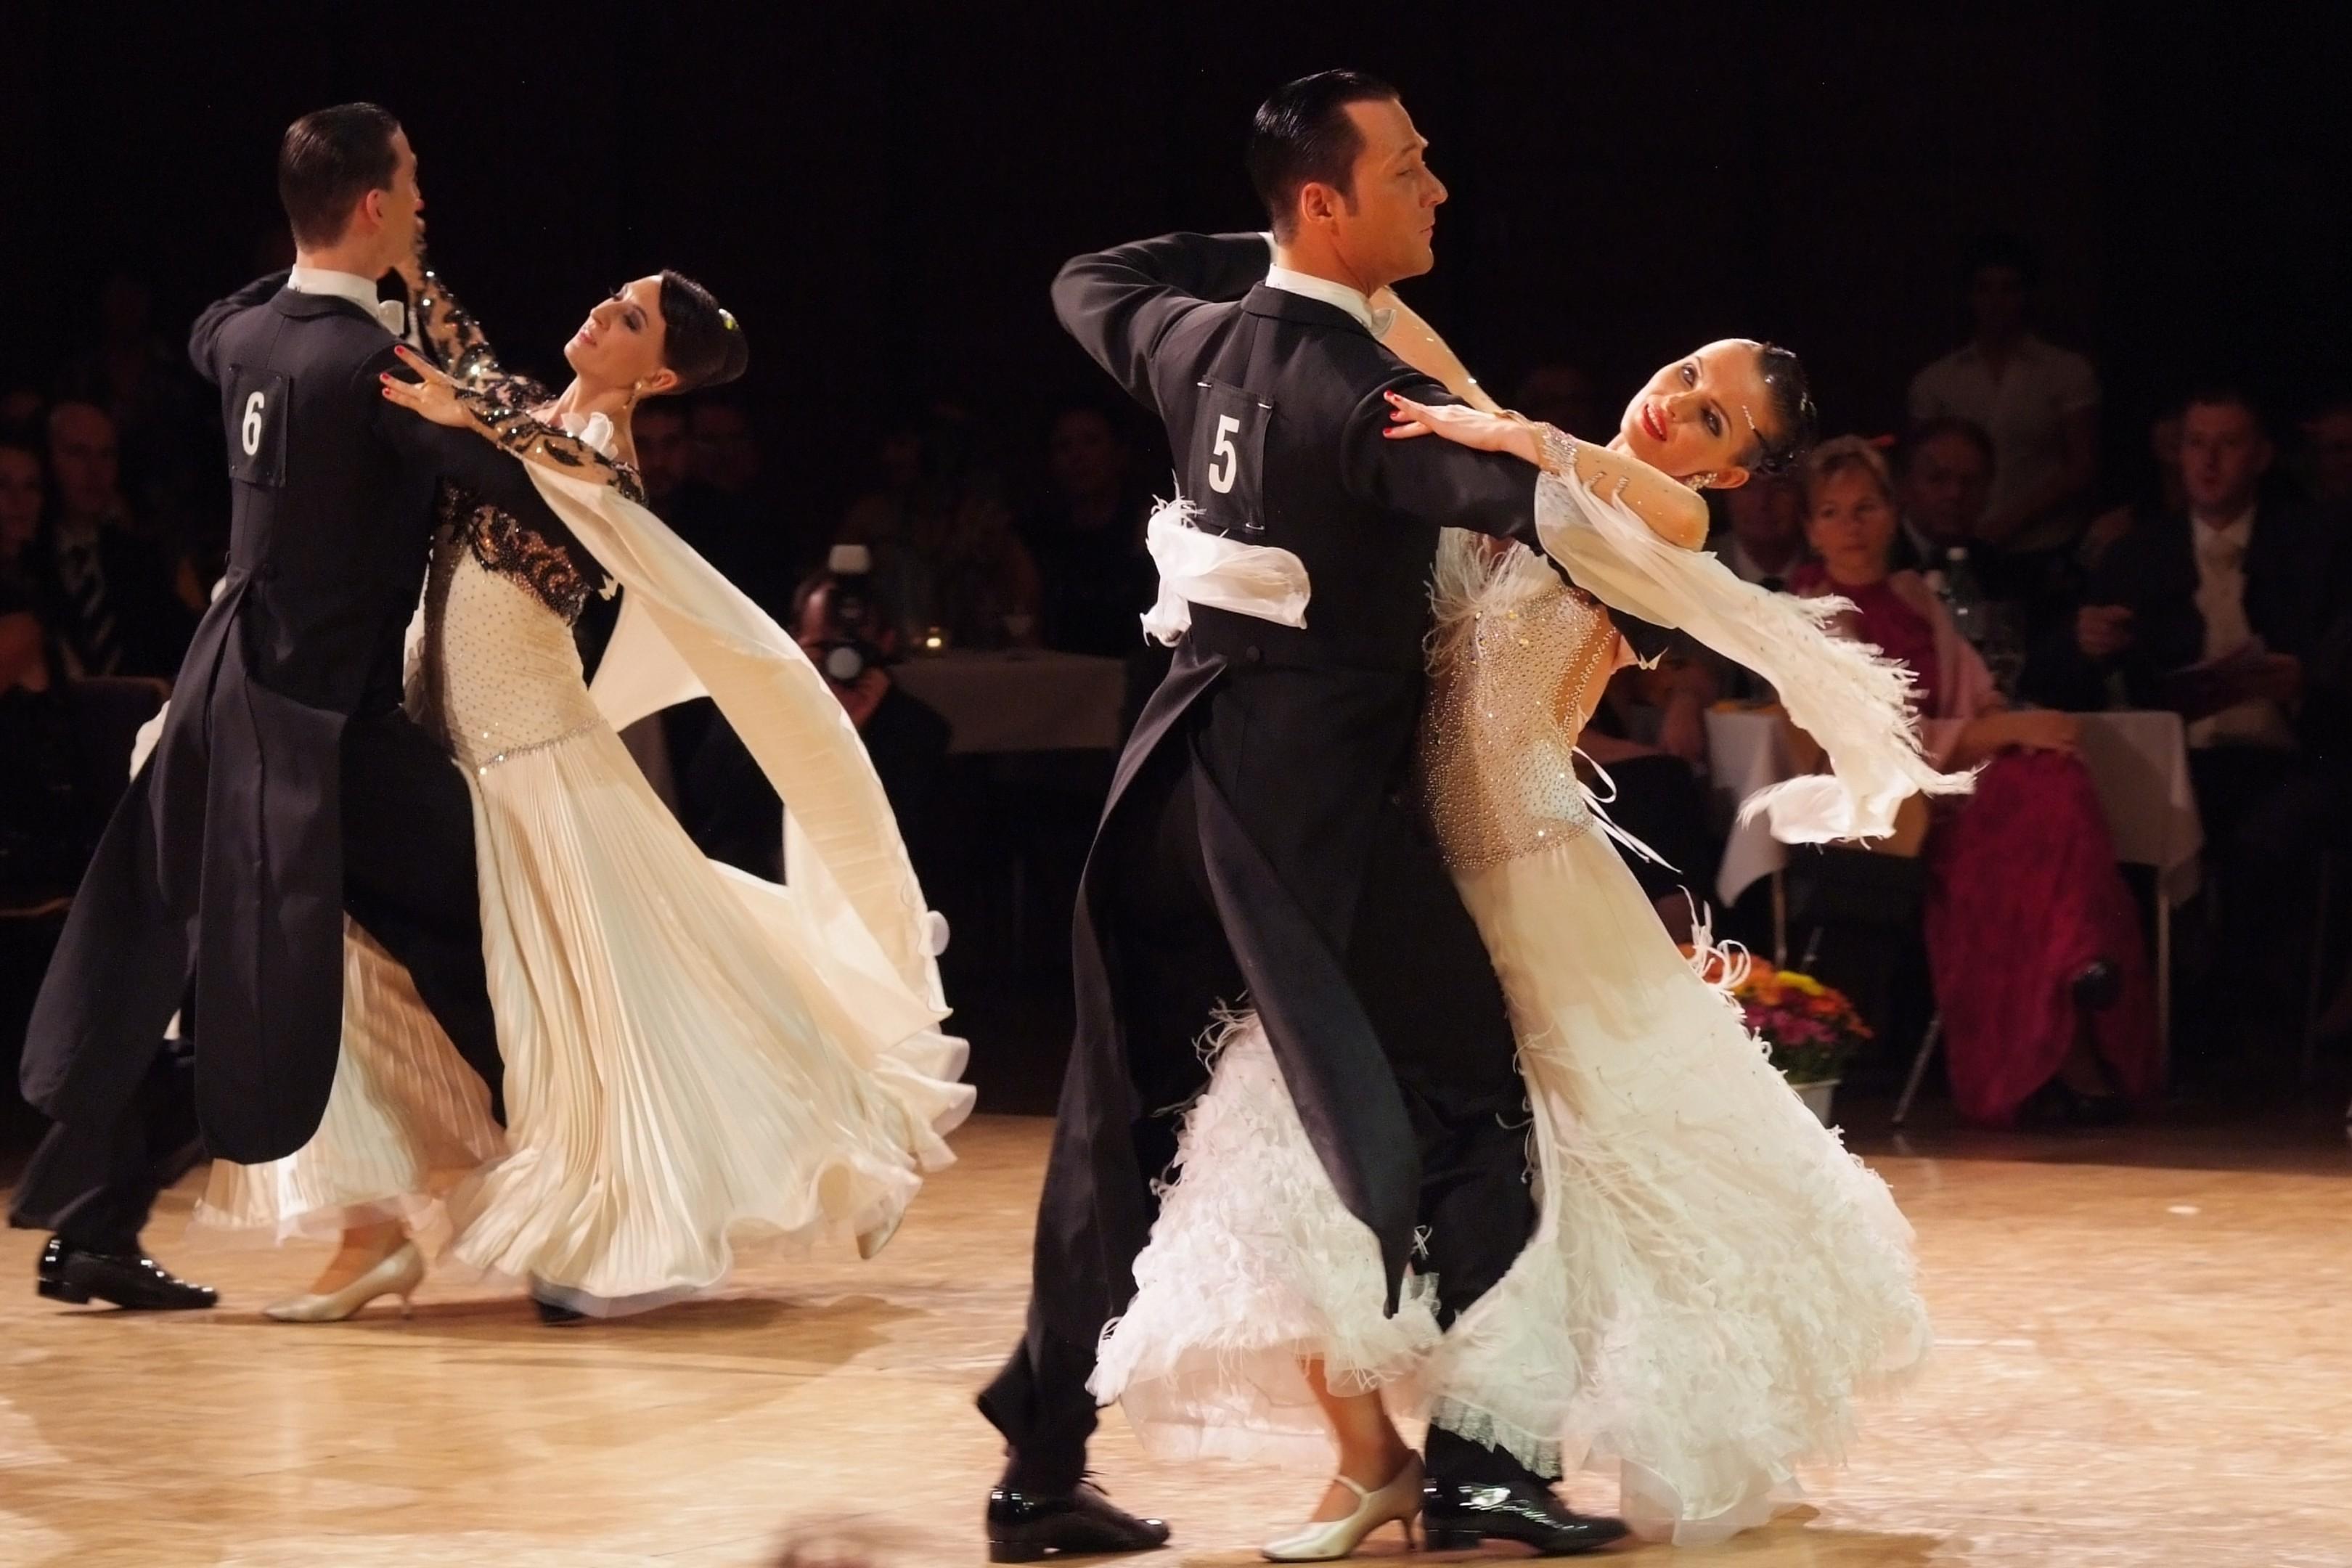 "Shownachmittag ""Showtime non-stop!"" im Rahmen des Tanzturniers"